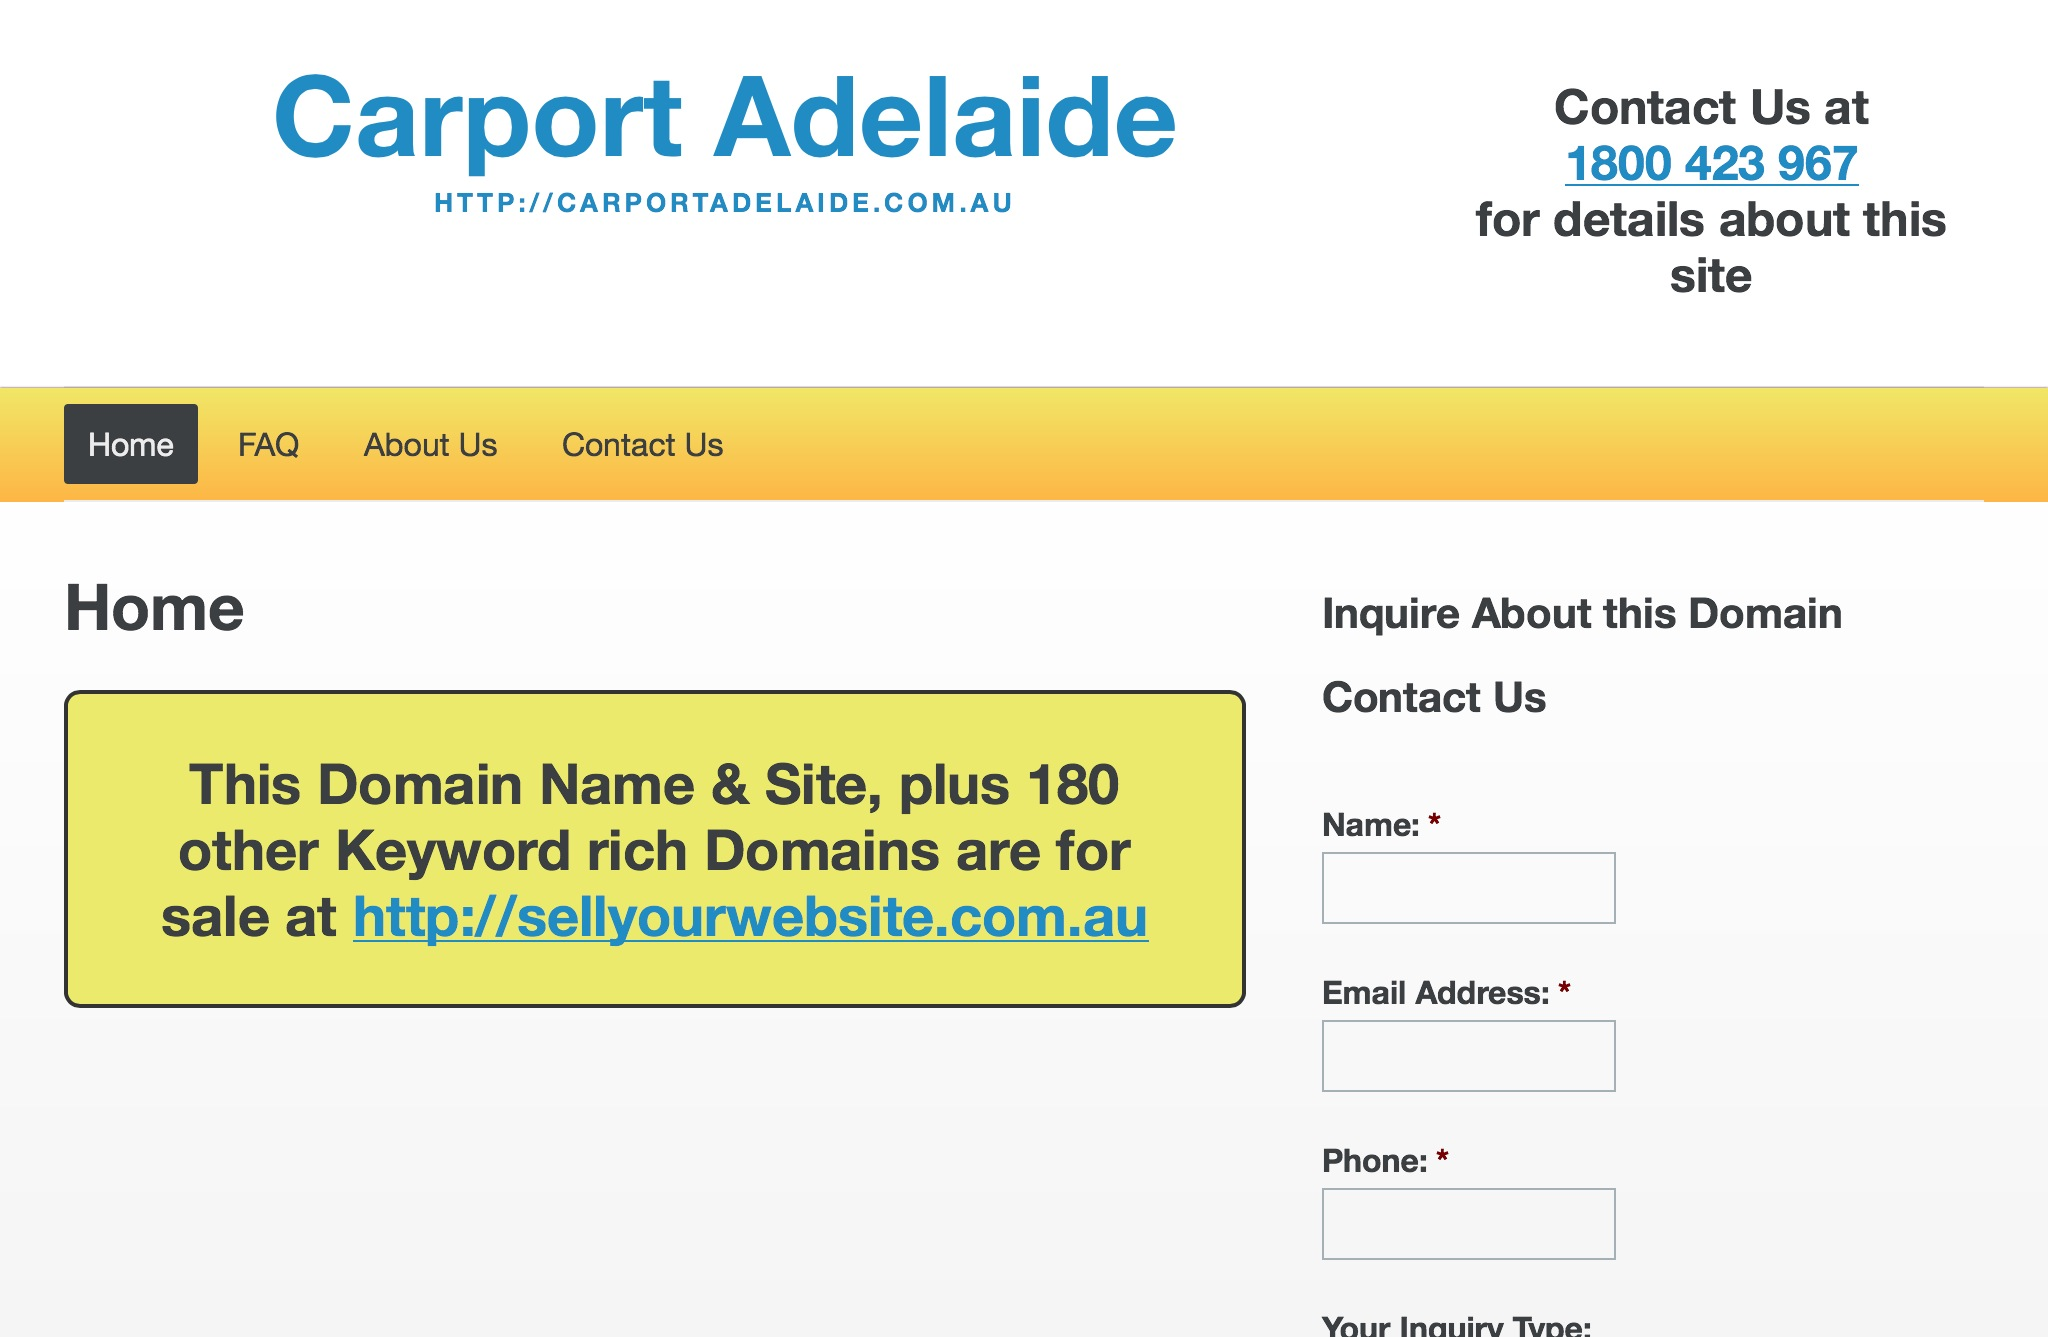 Carport Adelaide